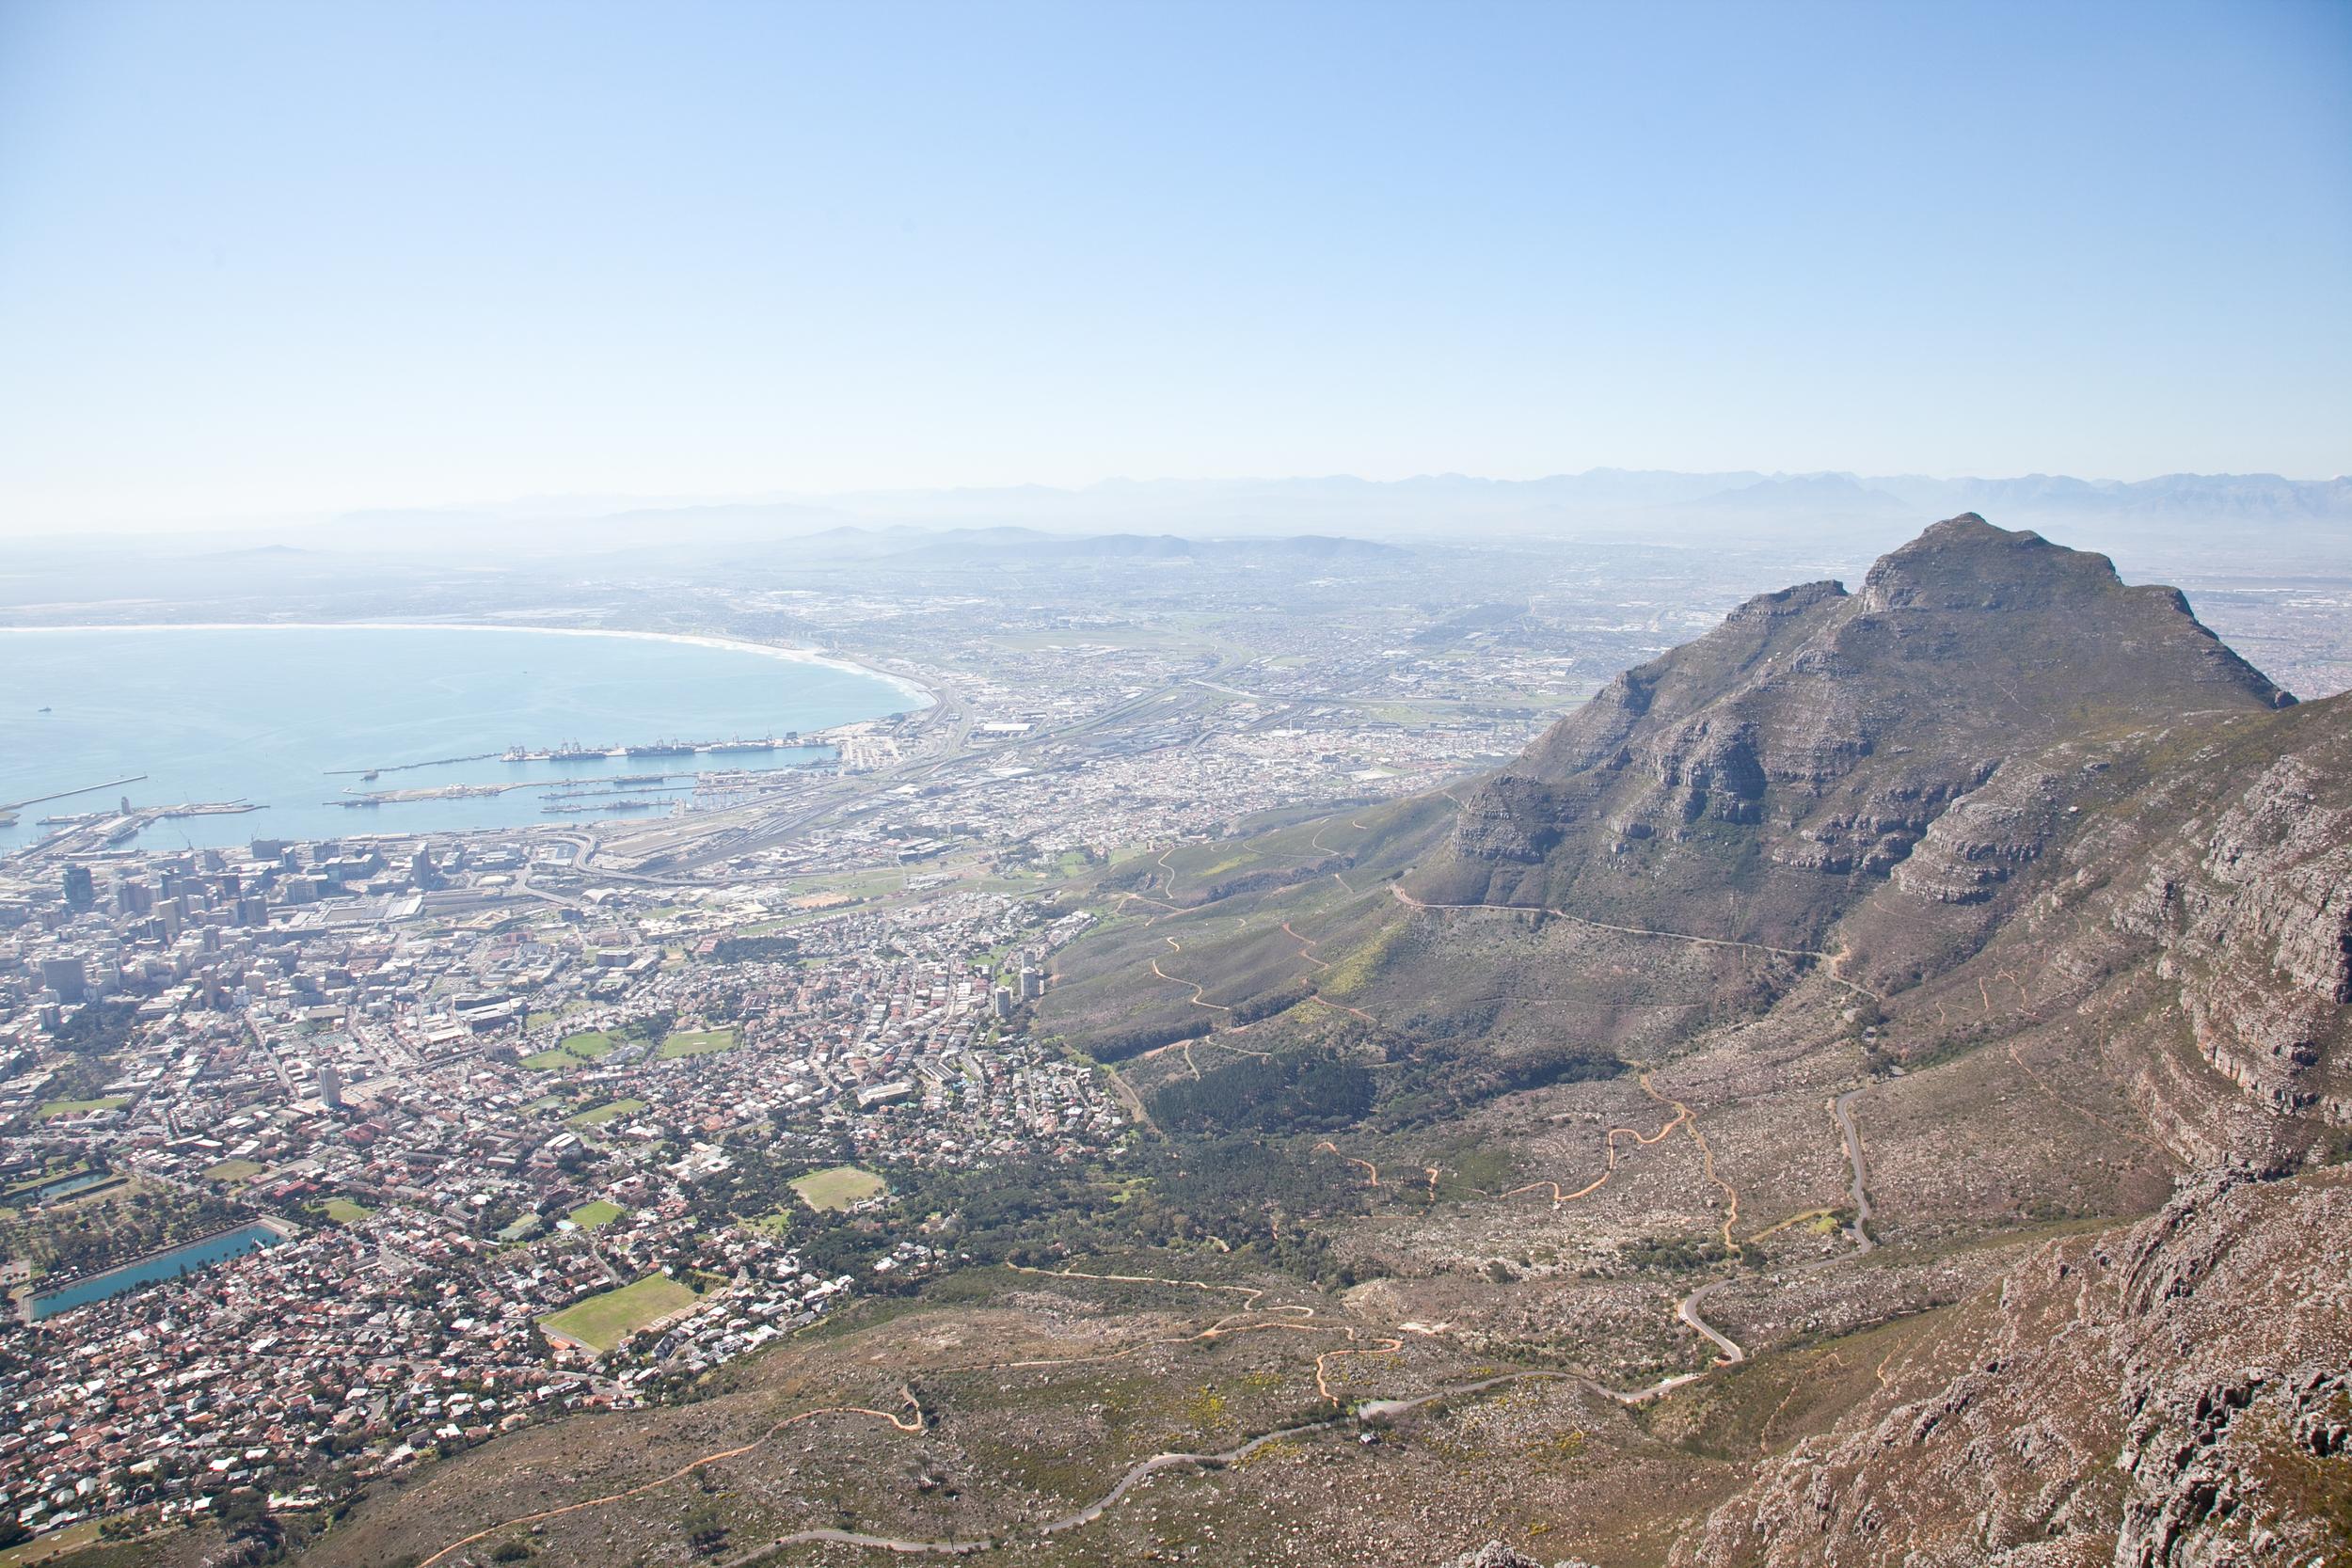 IMG_4711-table-mountain-cape-town-south-africa-trisa-taro.jpg